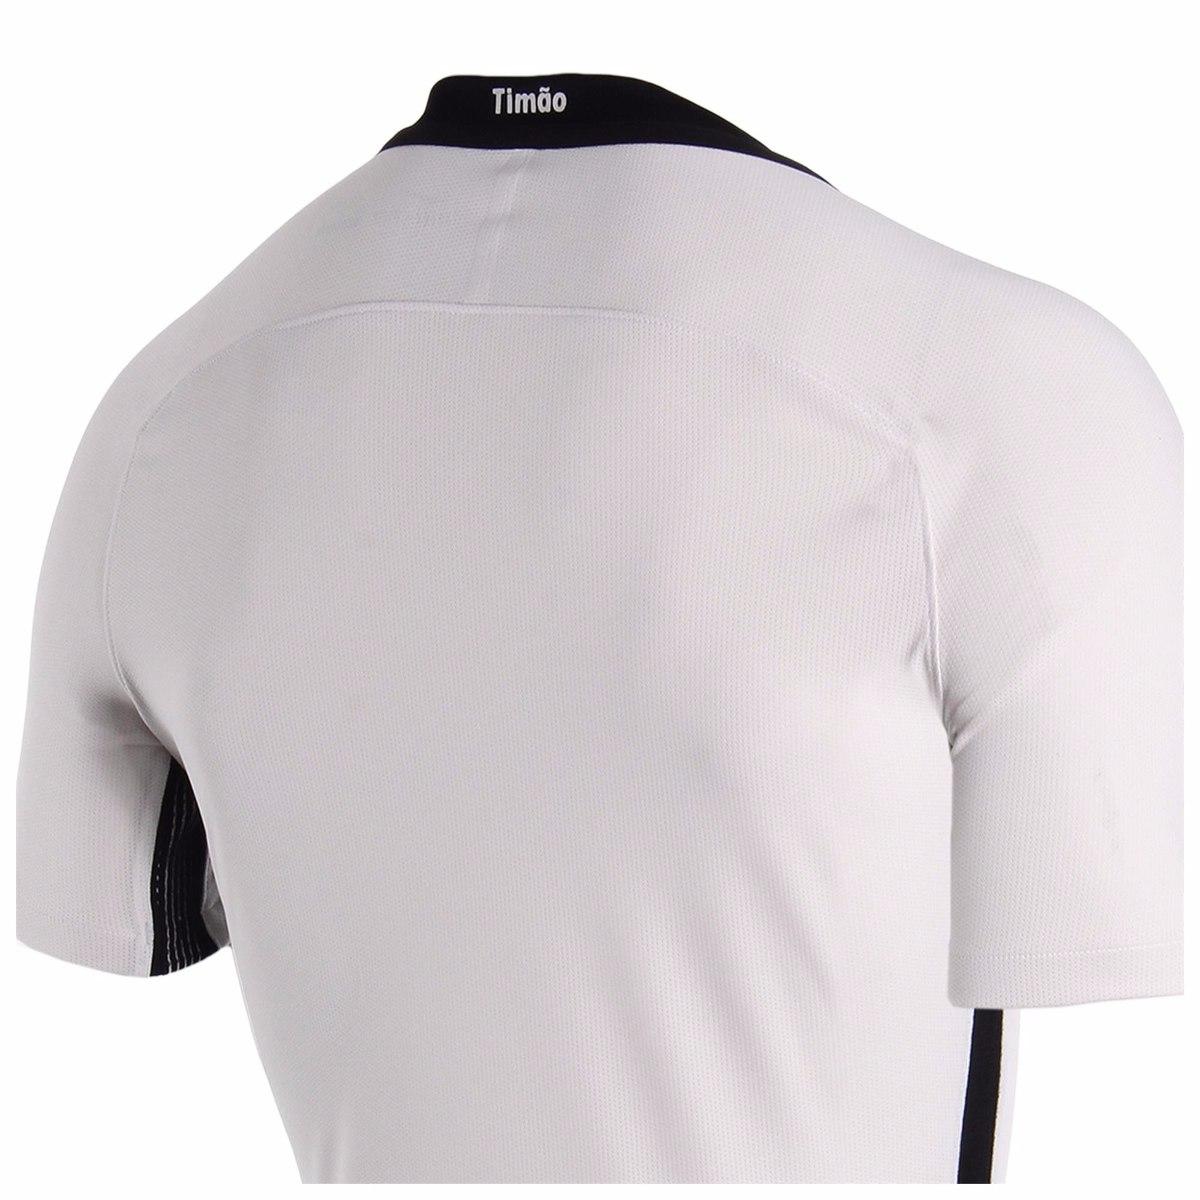 camisa corinthians nike feminina 2016 17 - original. Carregando zoom. 1d0b332bdbb15